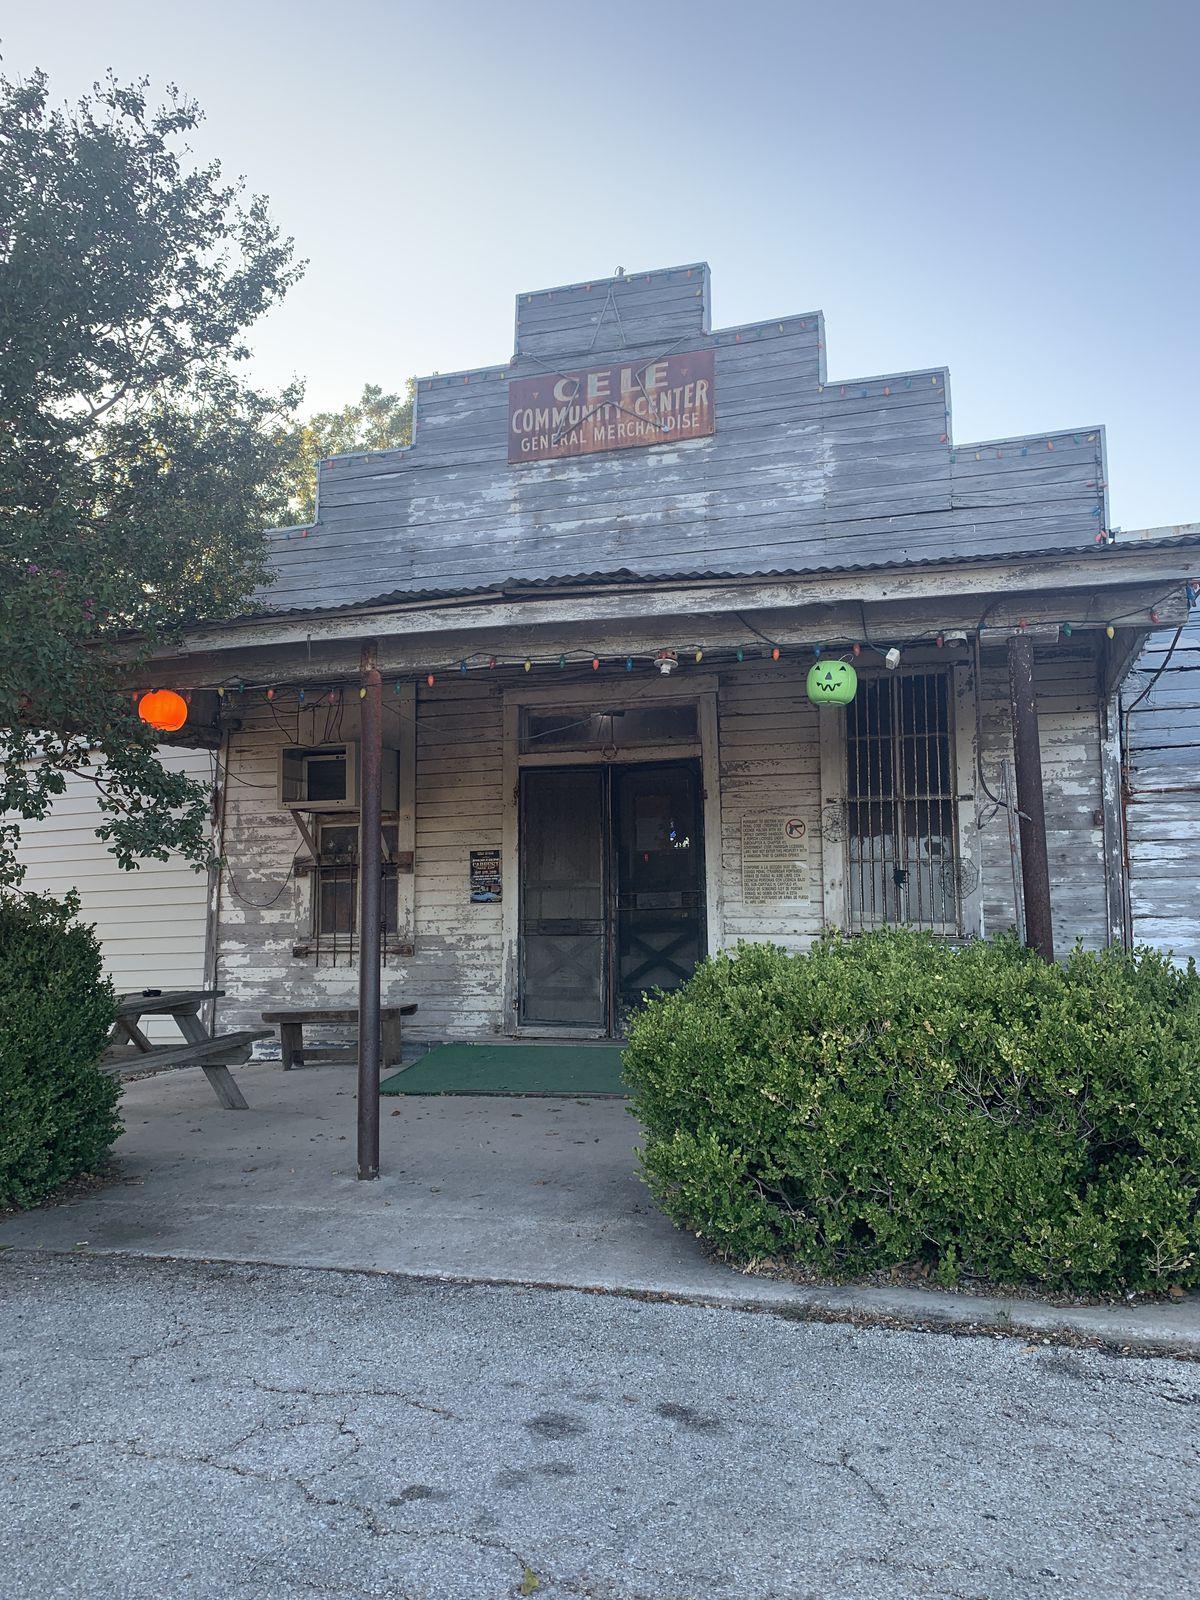 The Cele Store